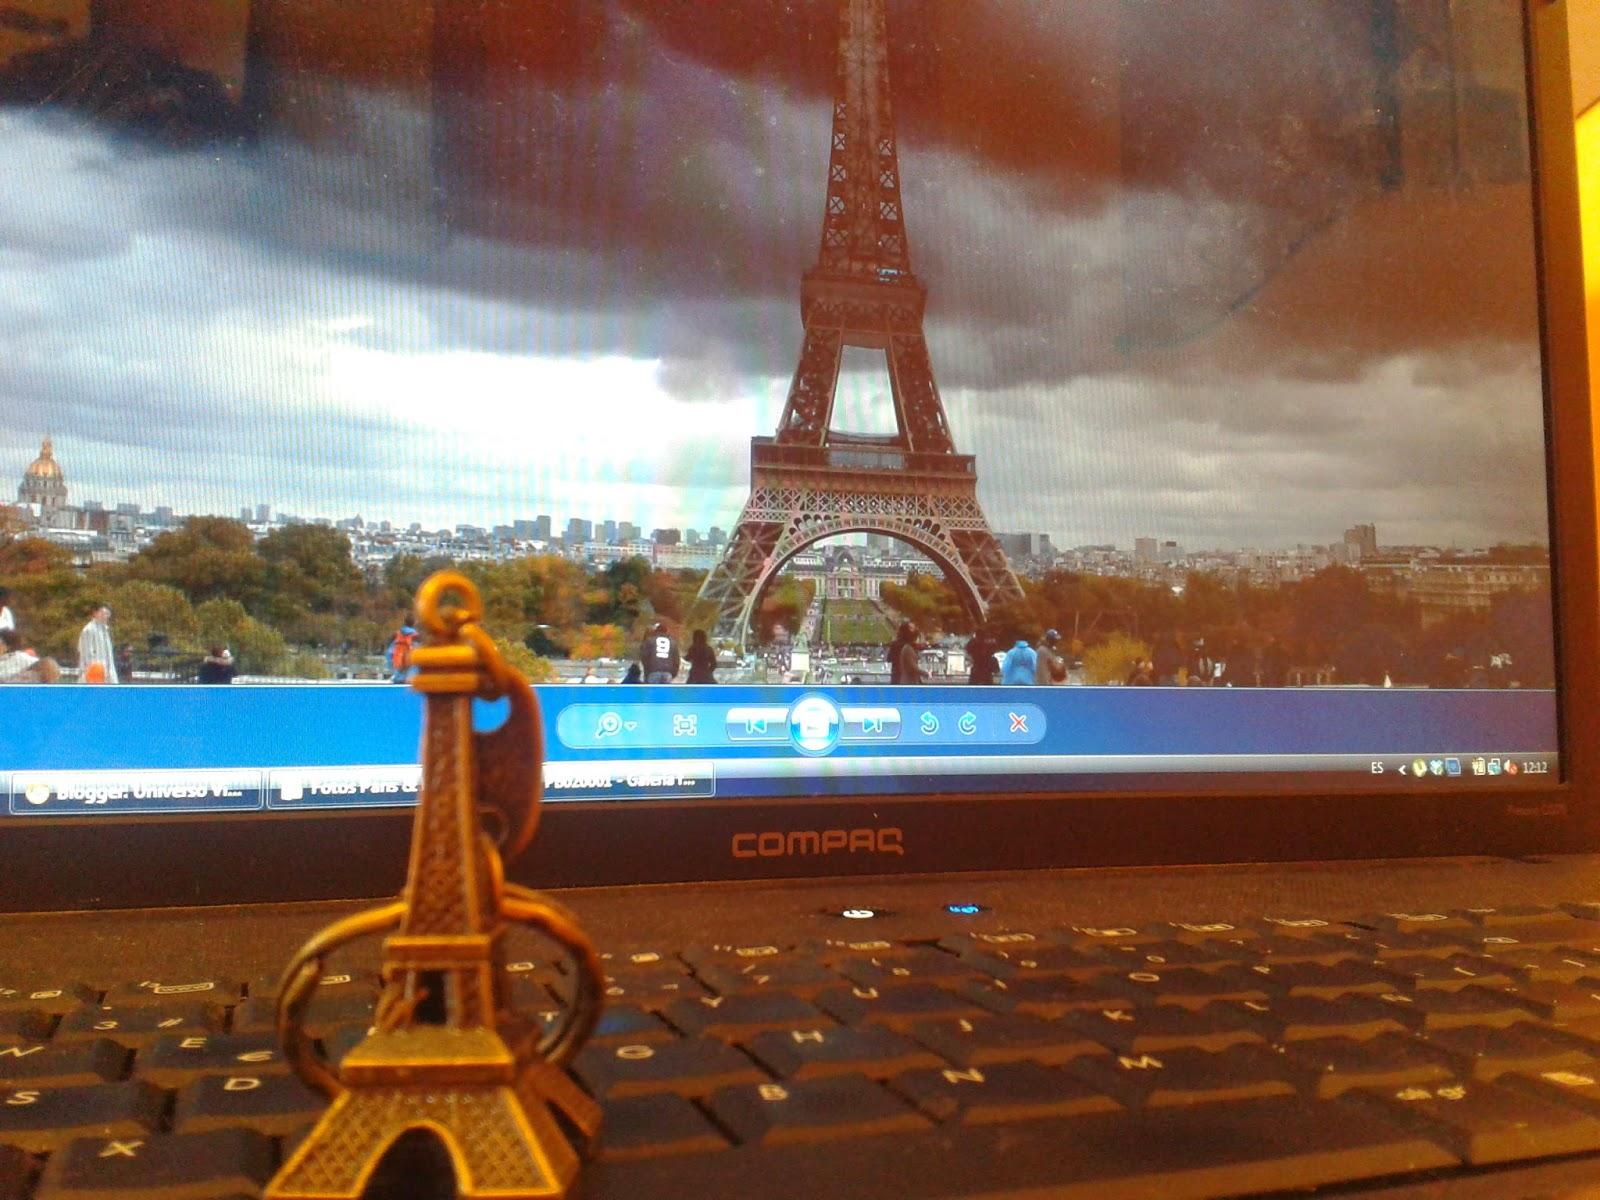 Premio Concurso I Aniversario Universo Viajero, Llavero Torre Eiffel